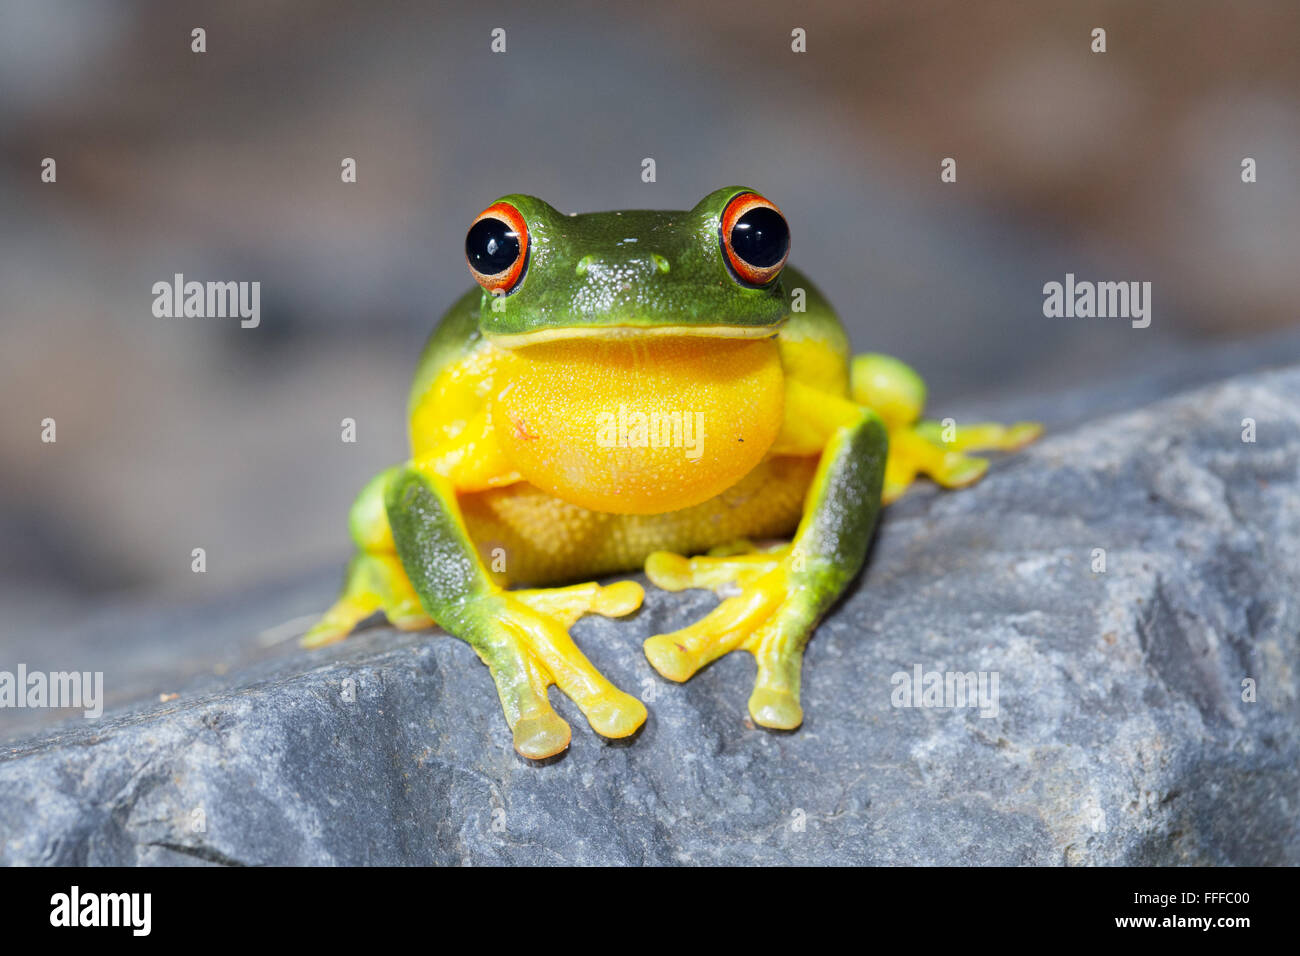 Australian Red-eyed tree frog (Litoria chloris), also known as Orange-eyed Tree frog, NSW, Australia - Stock Image